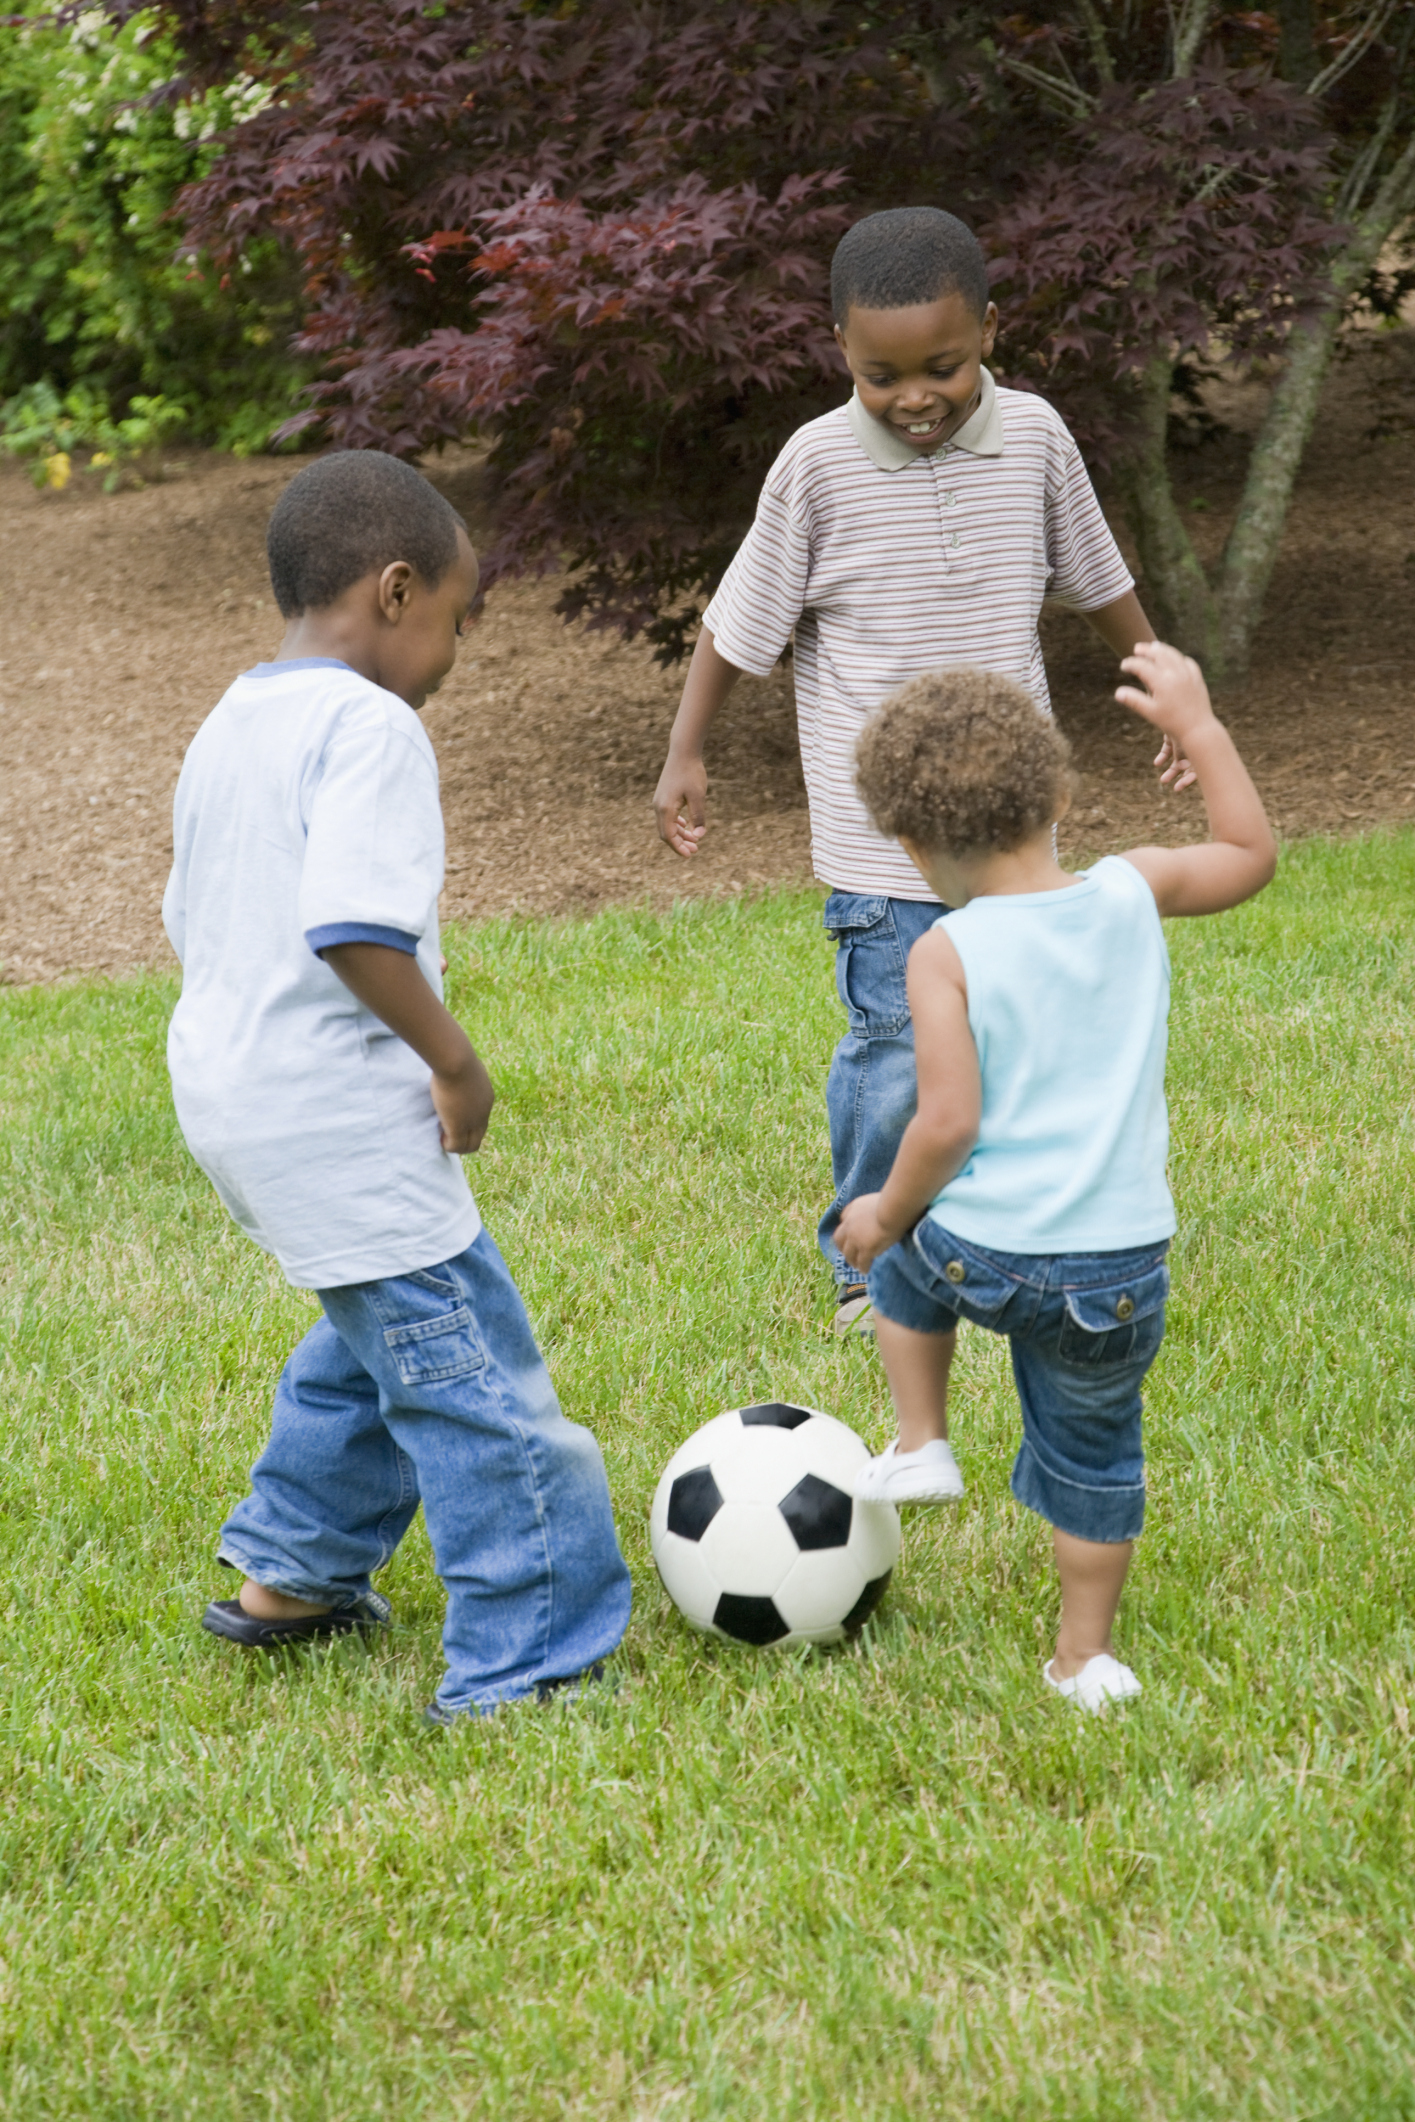 kicking games for kids livestrong com